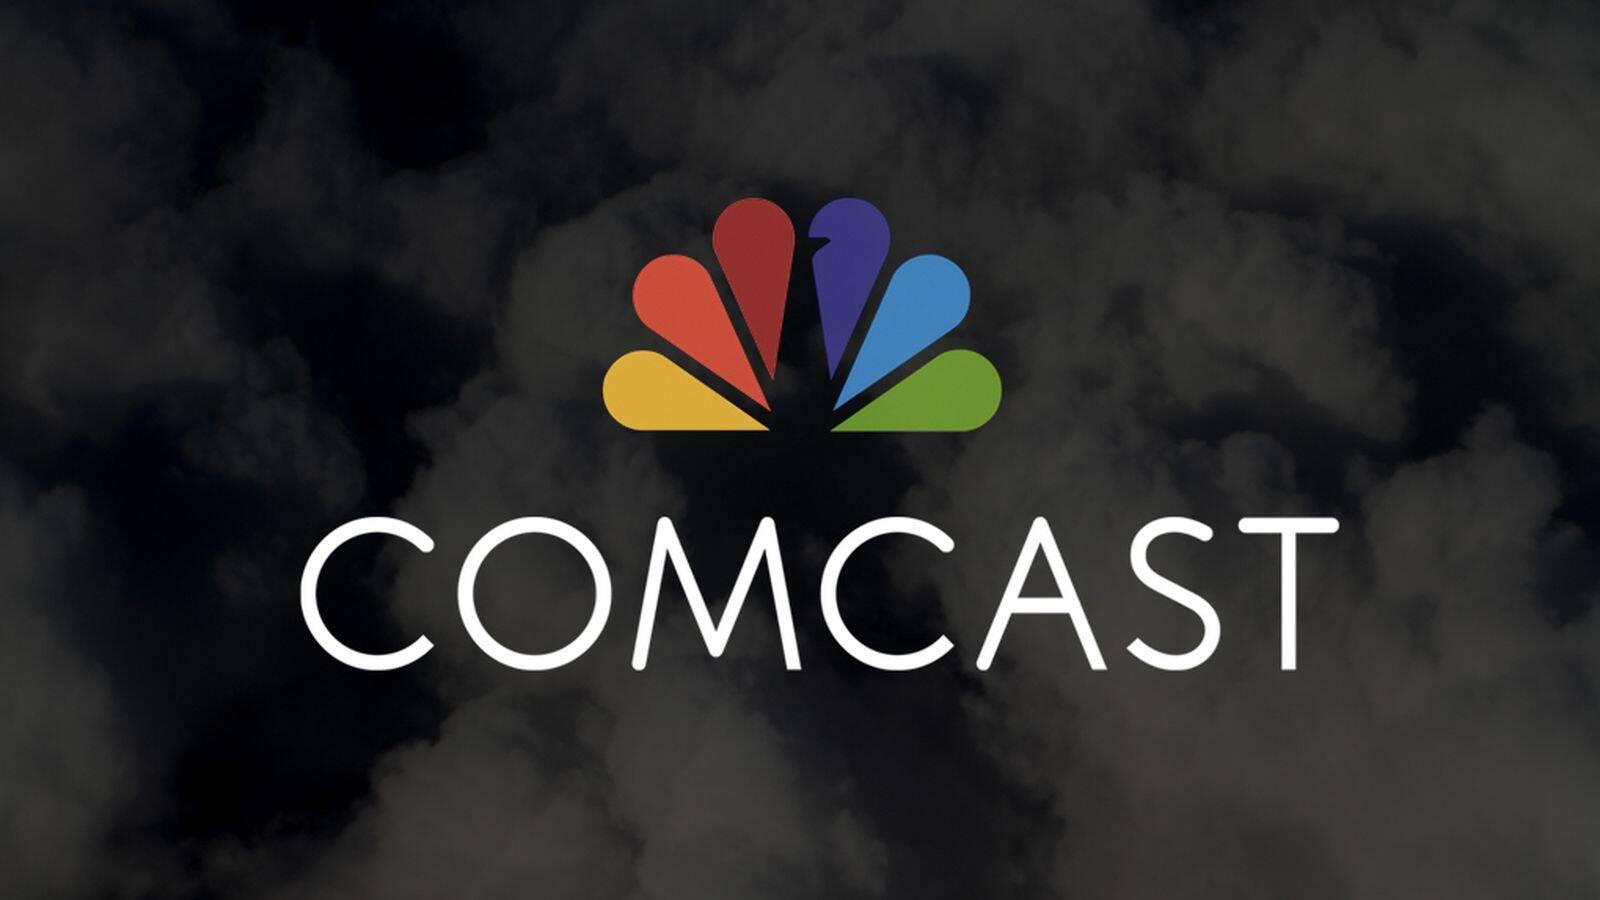 comcast.0